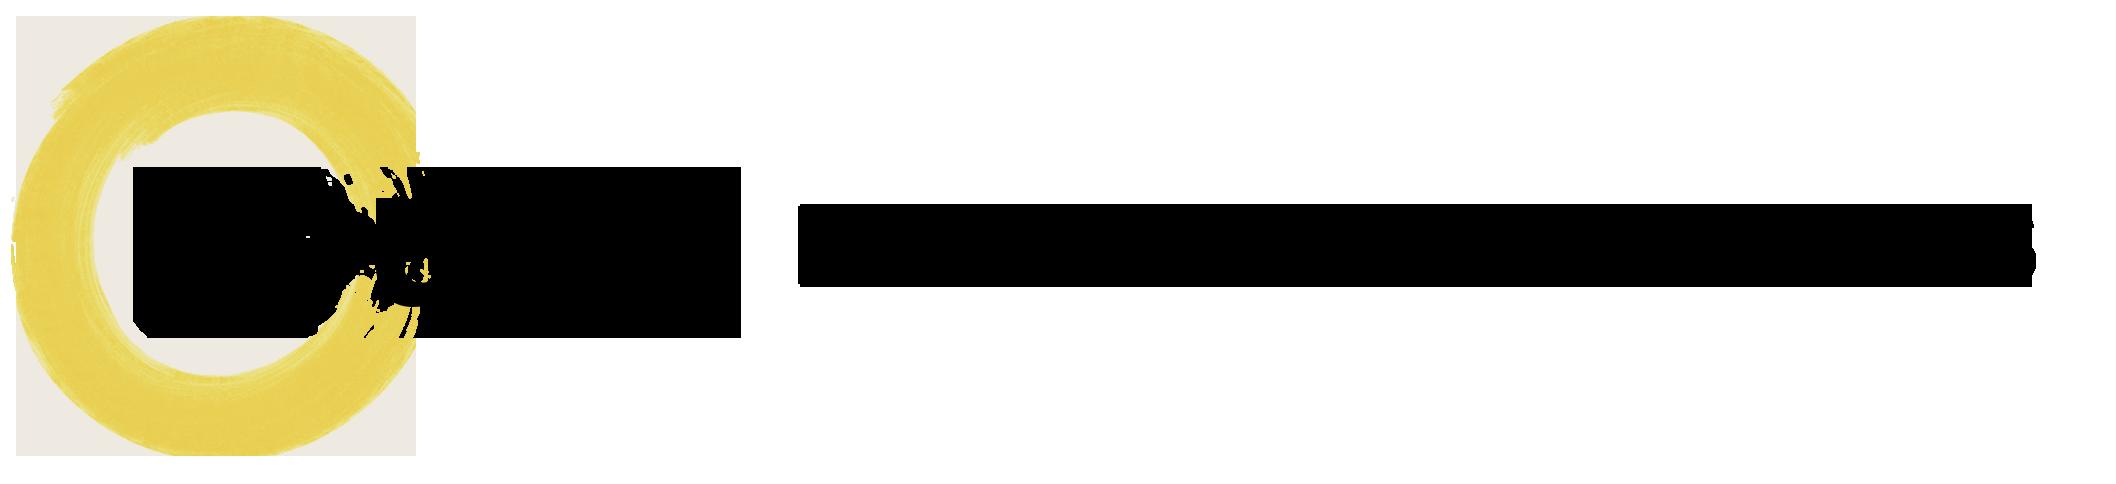 Logo trust for business